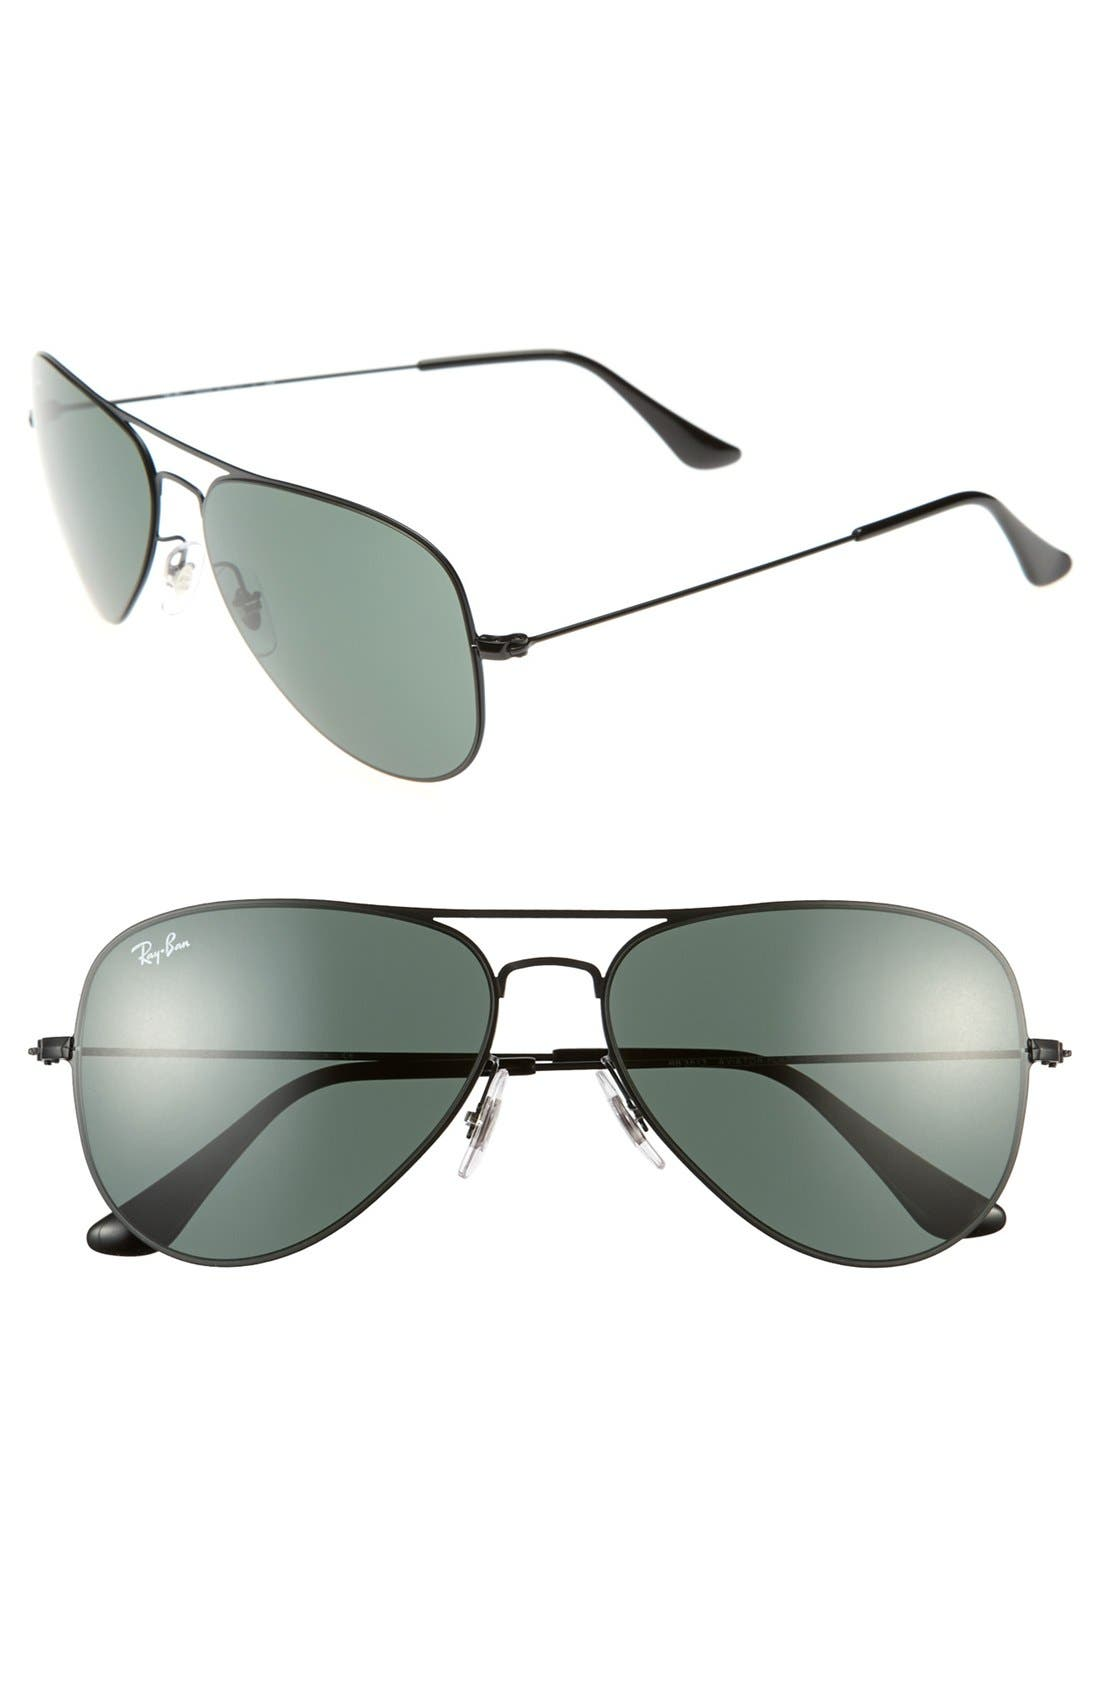 Main Image - Ray-Ban 'Aviator Flat Metal' 58mm Sunglasses